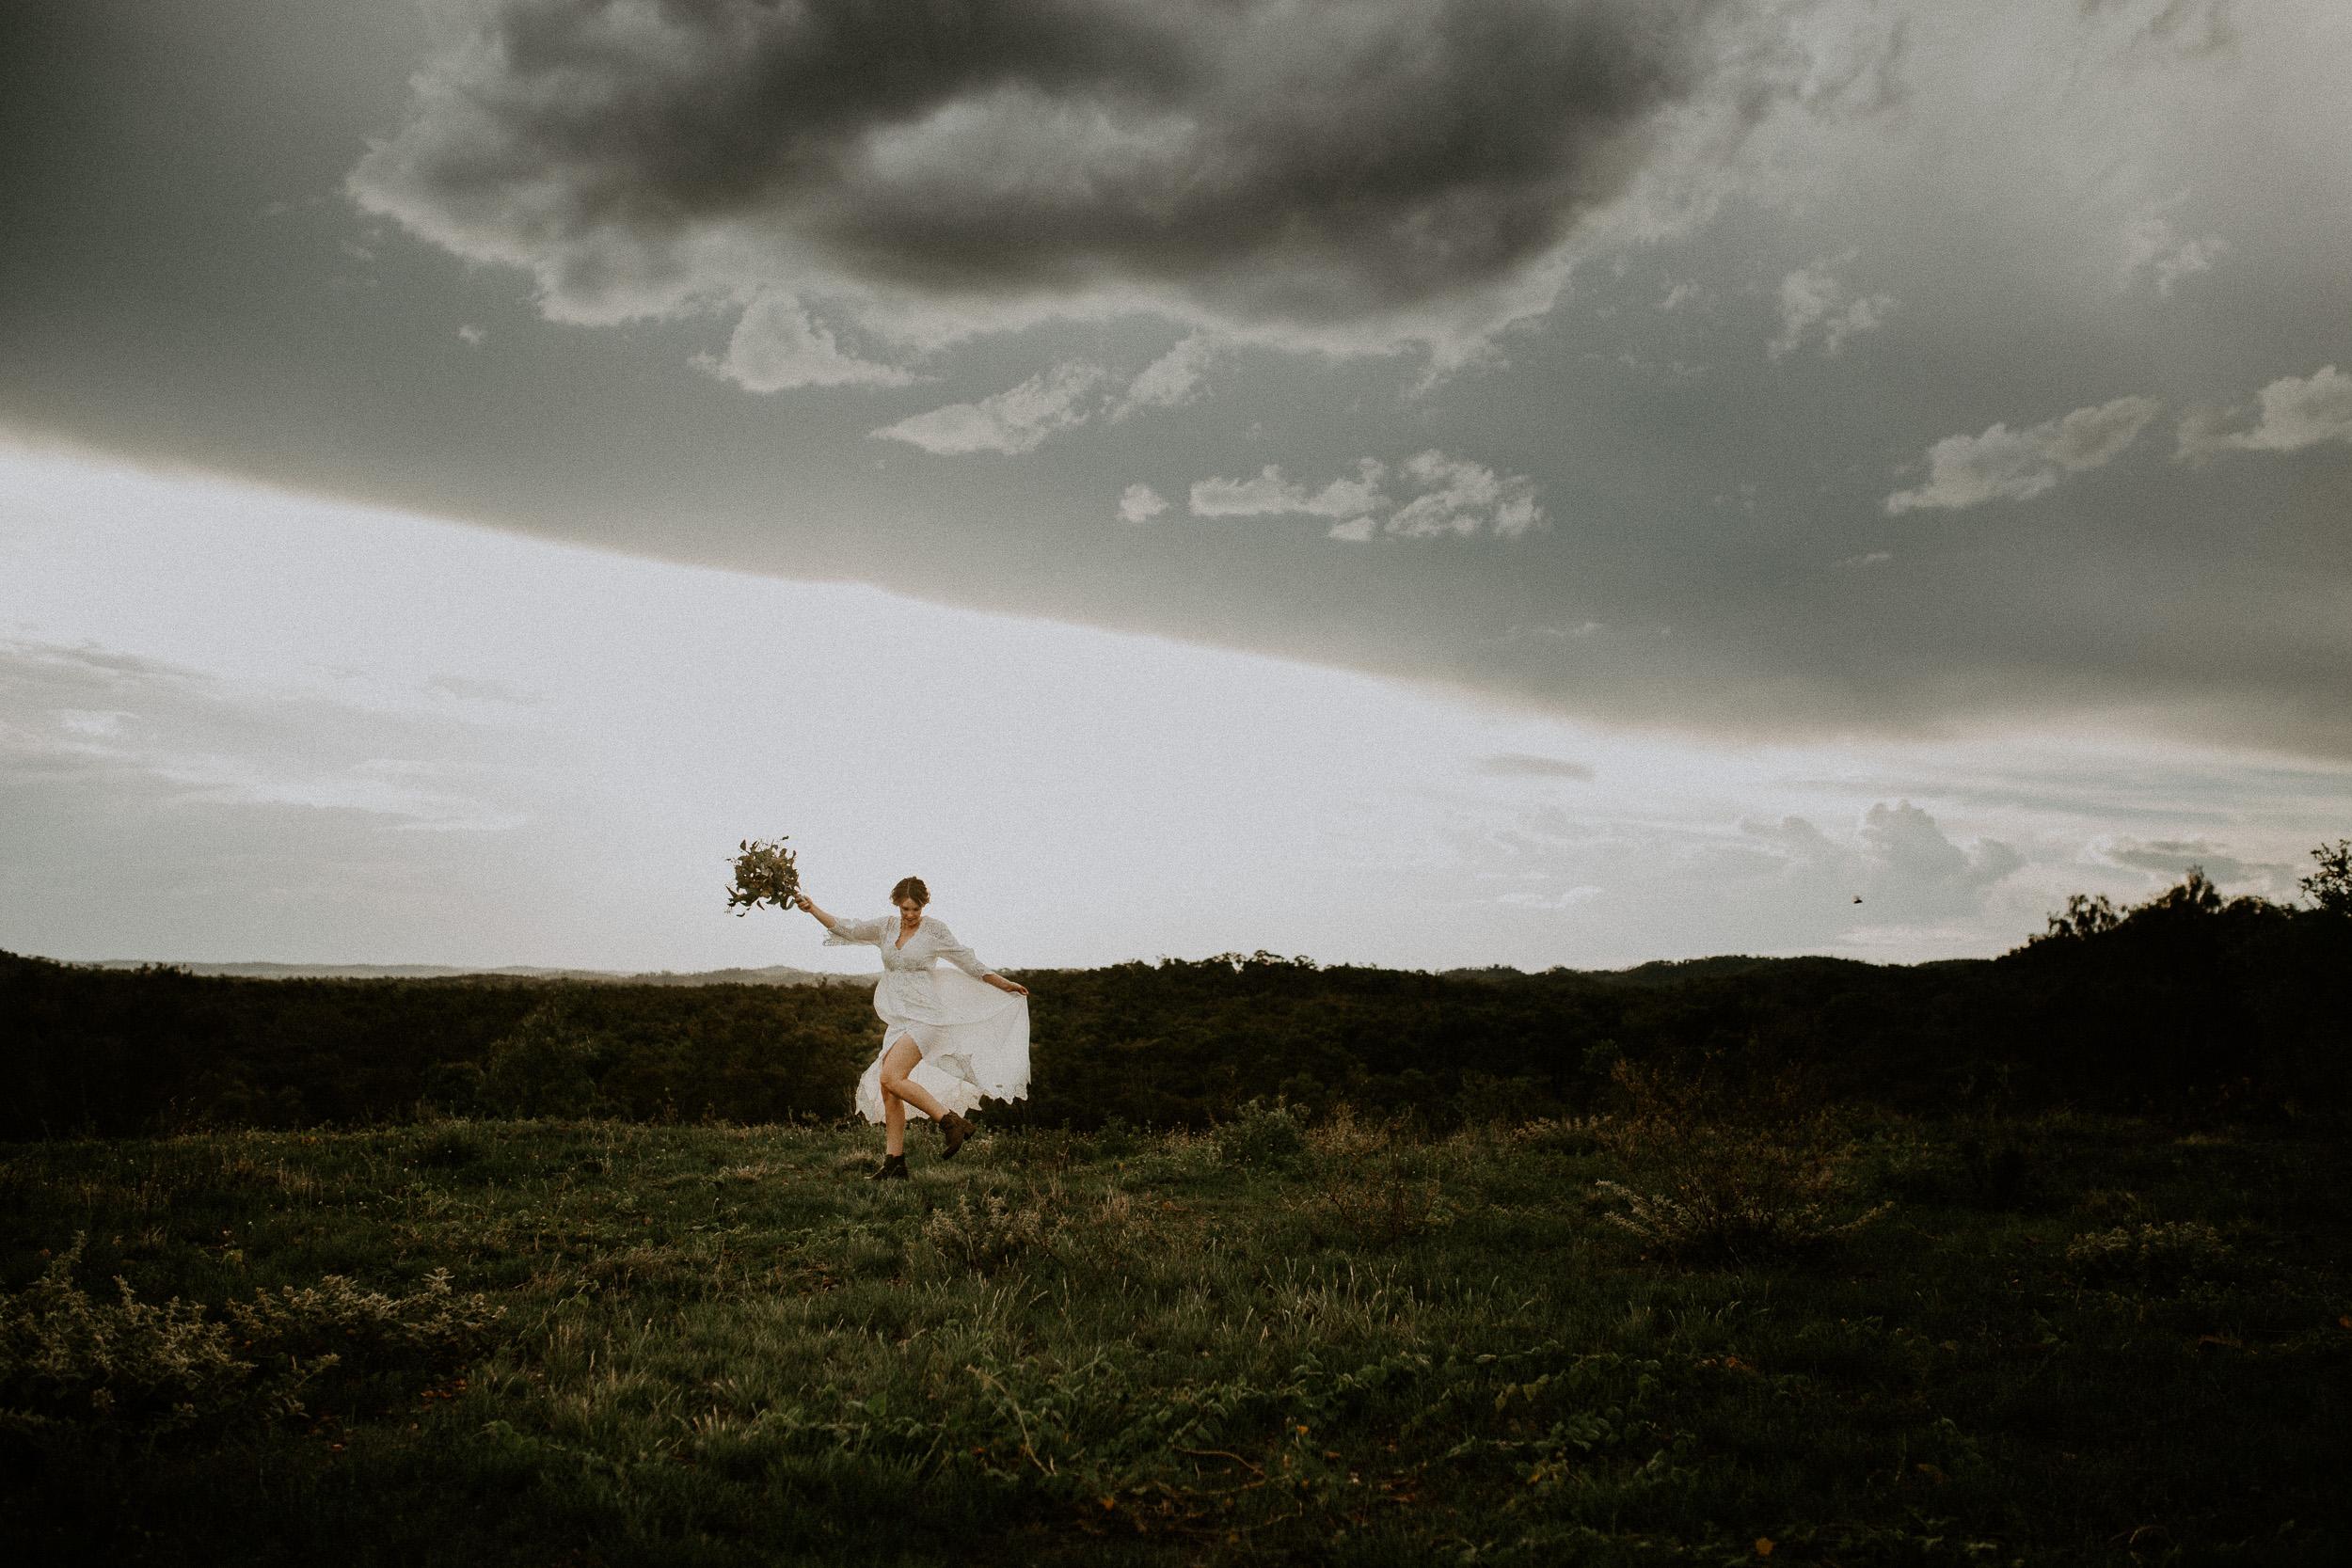 Baby-outdoor-family-lifestyle-townsville-wedding-inside-home-engagement-newborn-21.jpg